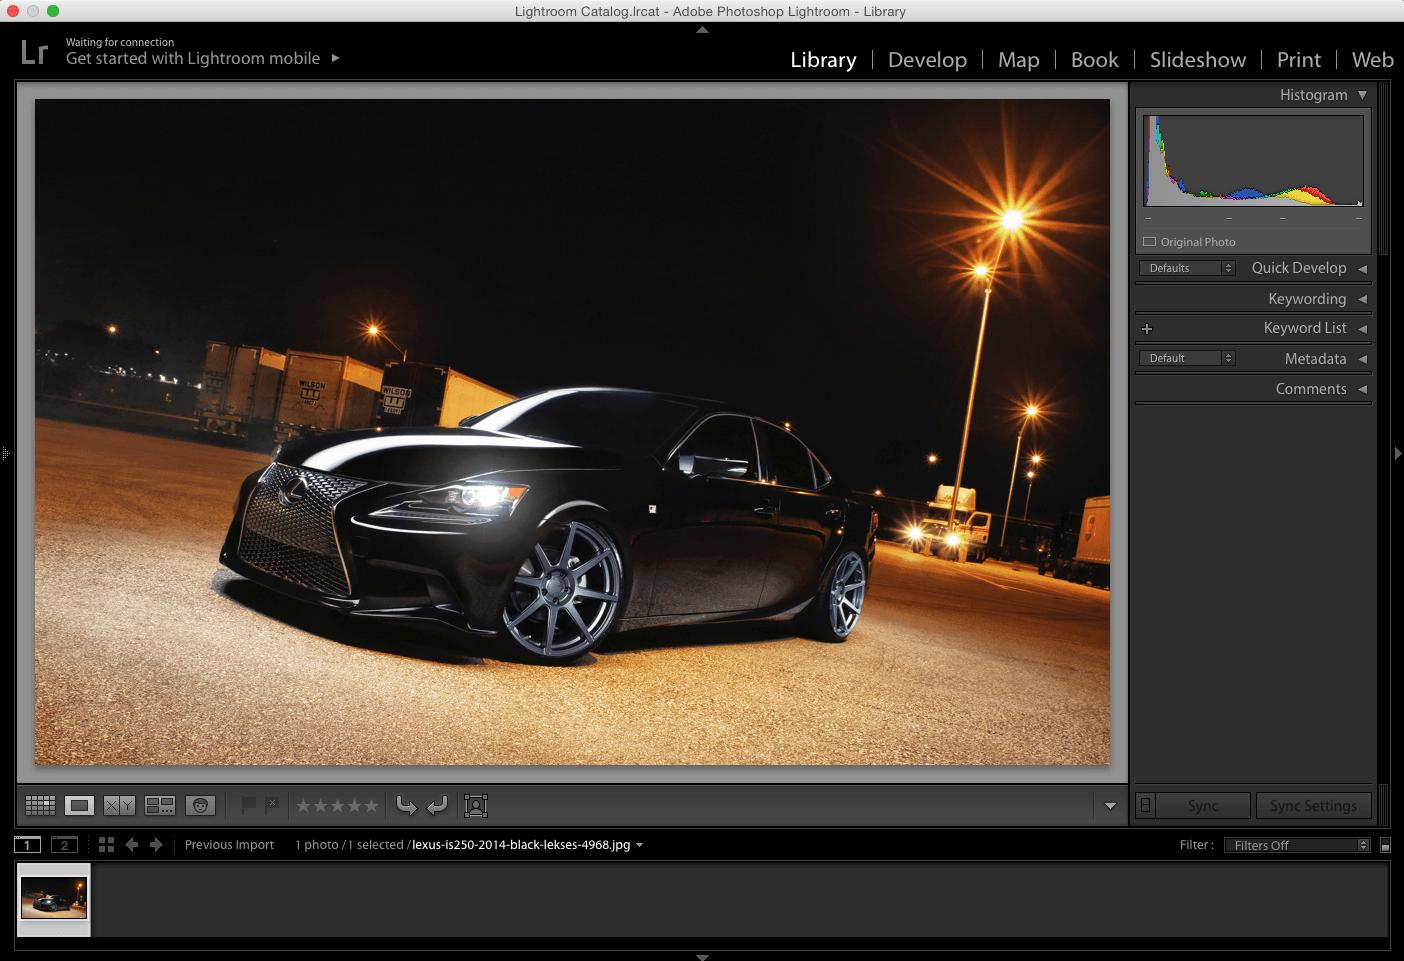 Adobe Photoshop Lightroom 6 12 CC for Mac download | macOS